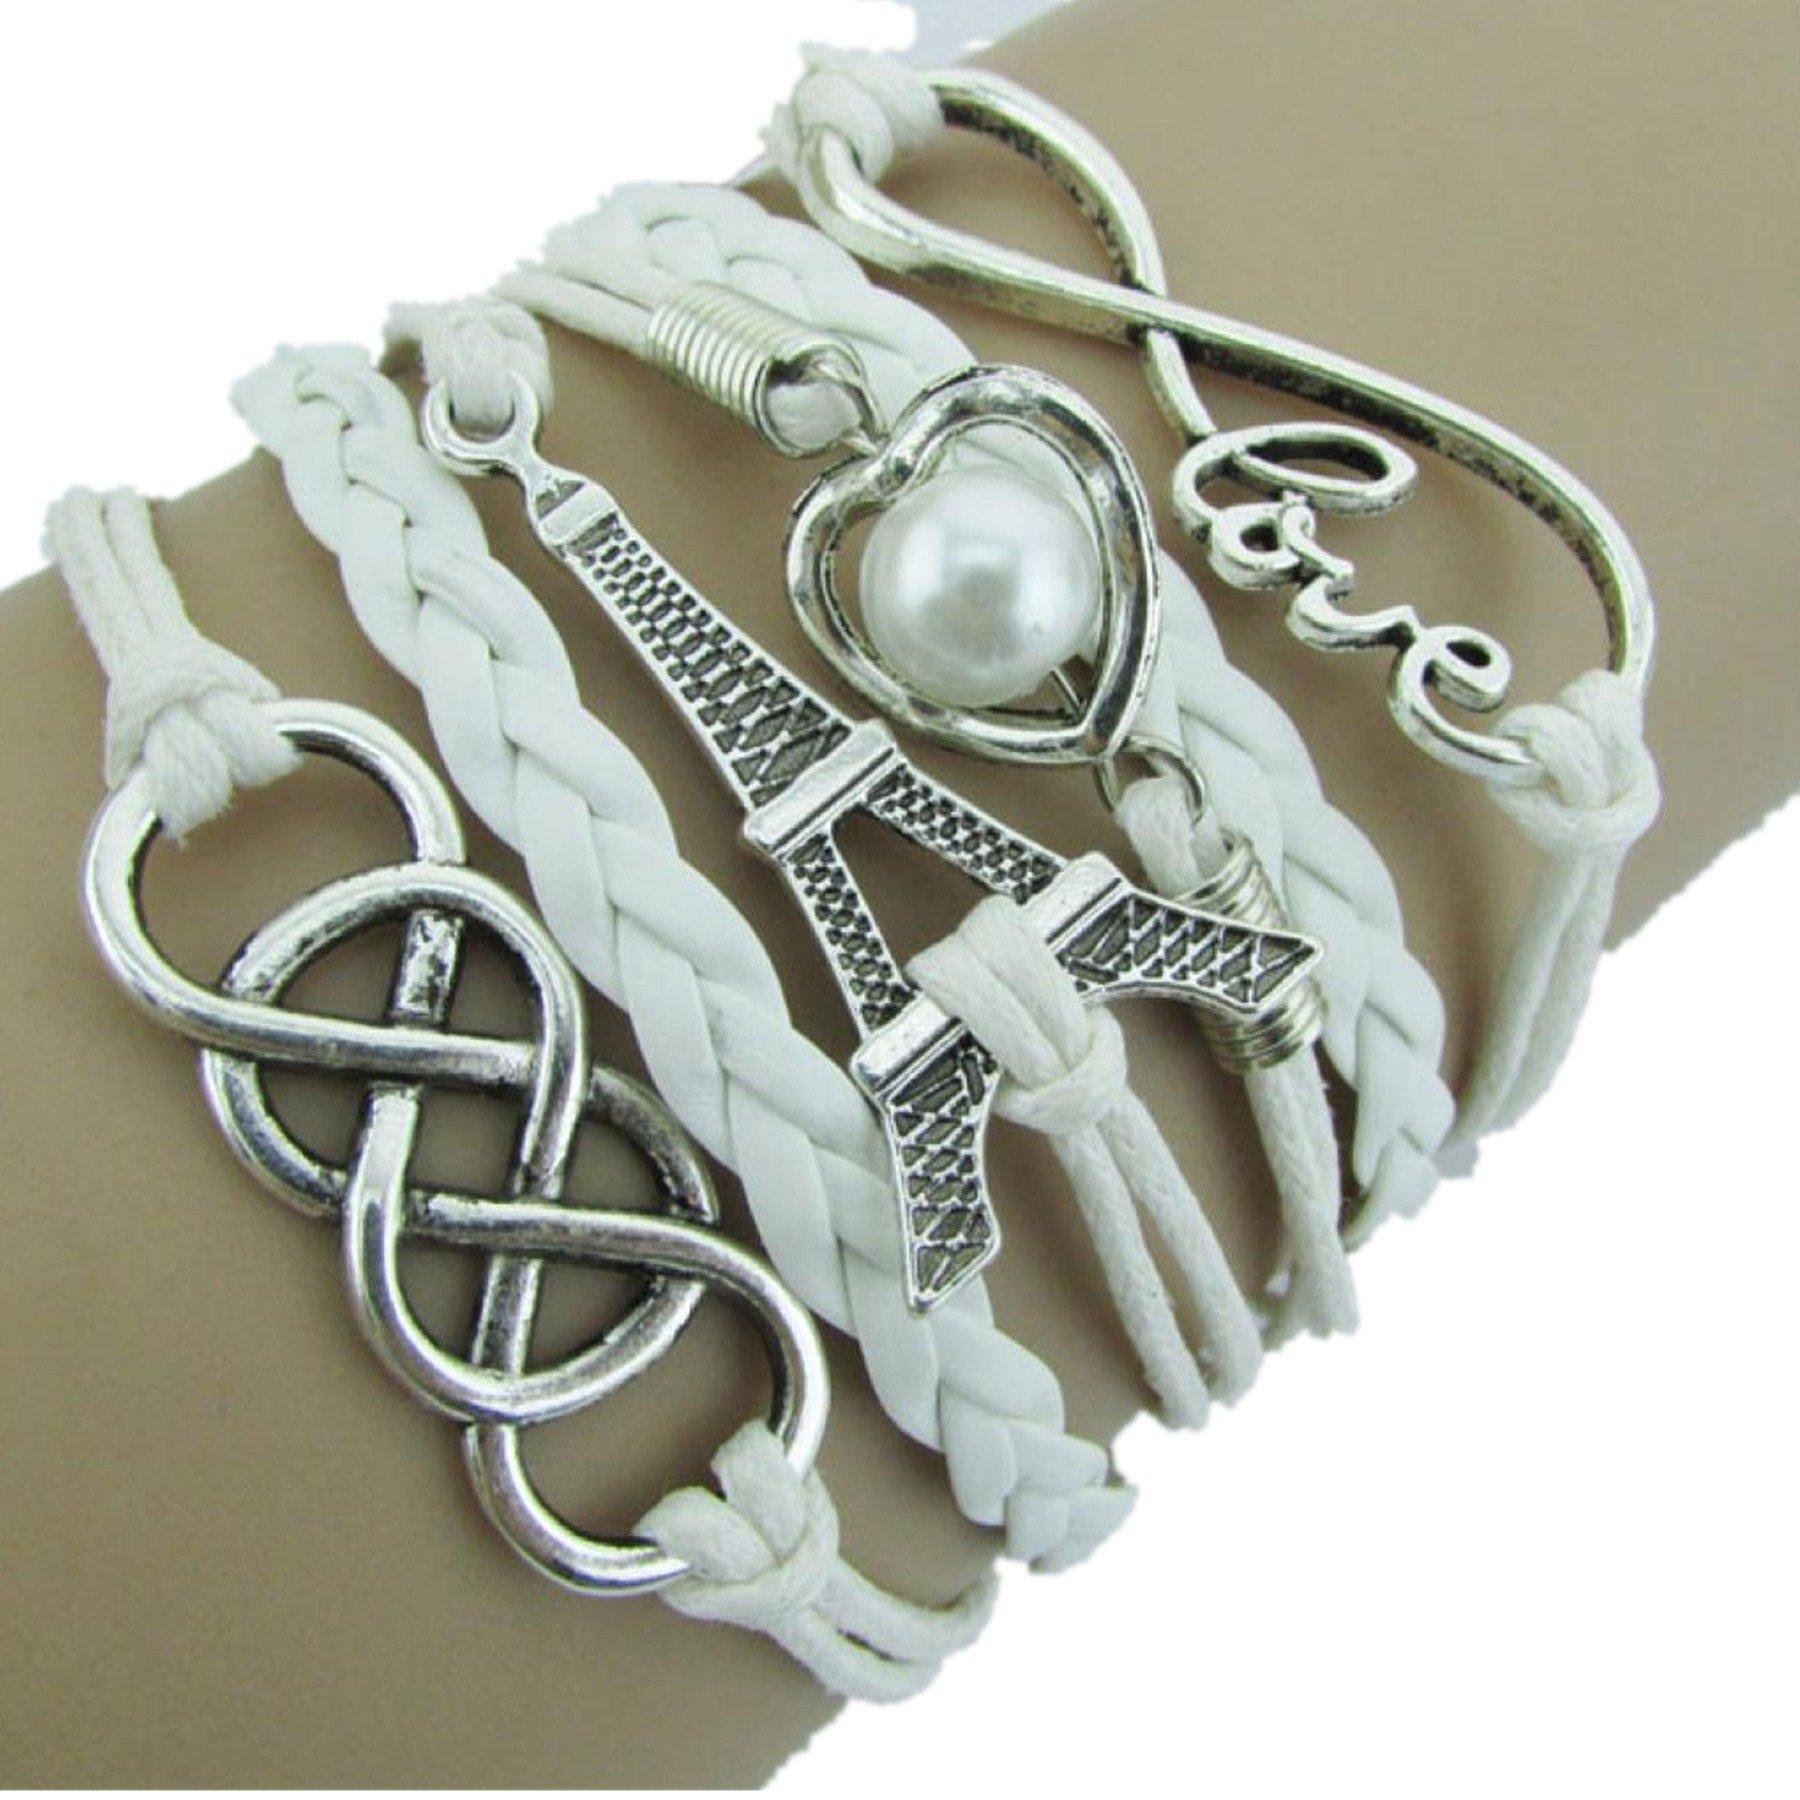 Challyhope Clearance Clearance! Vintage LOVE Heart Eiffel Tower Multilayer Cuff Bangle Handmade Wove Friendship Charm Leather Bracelet